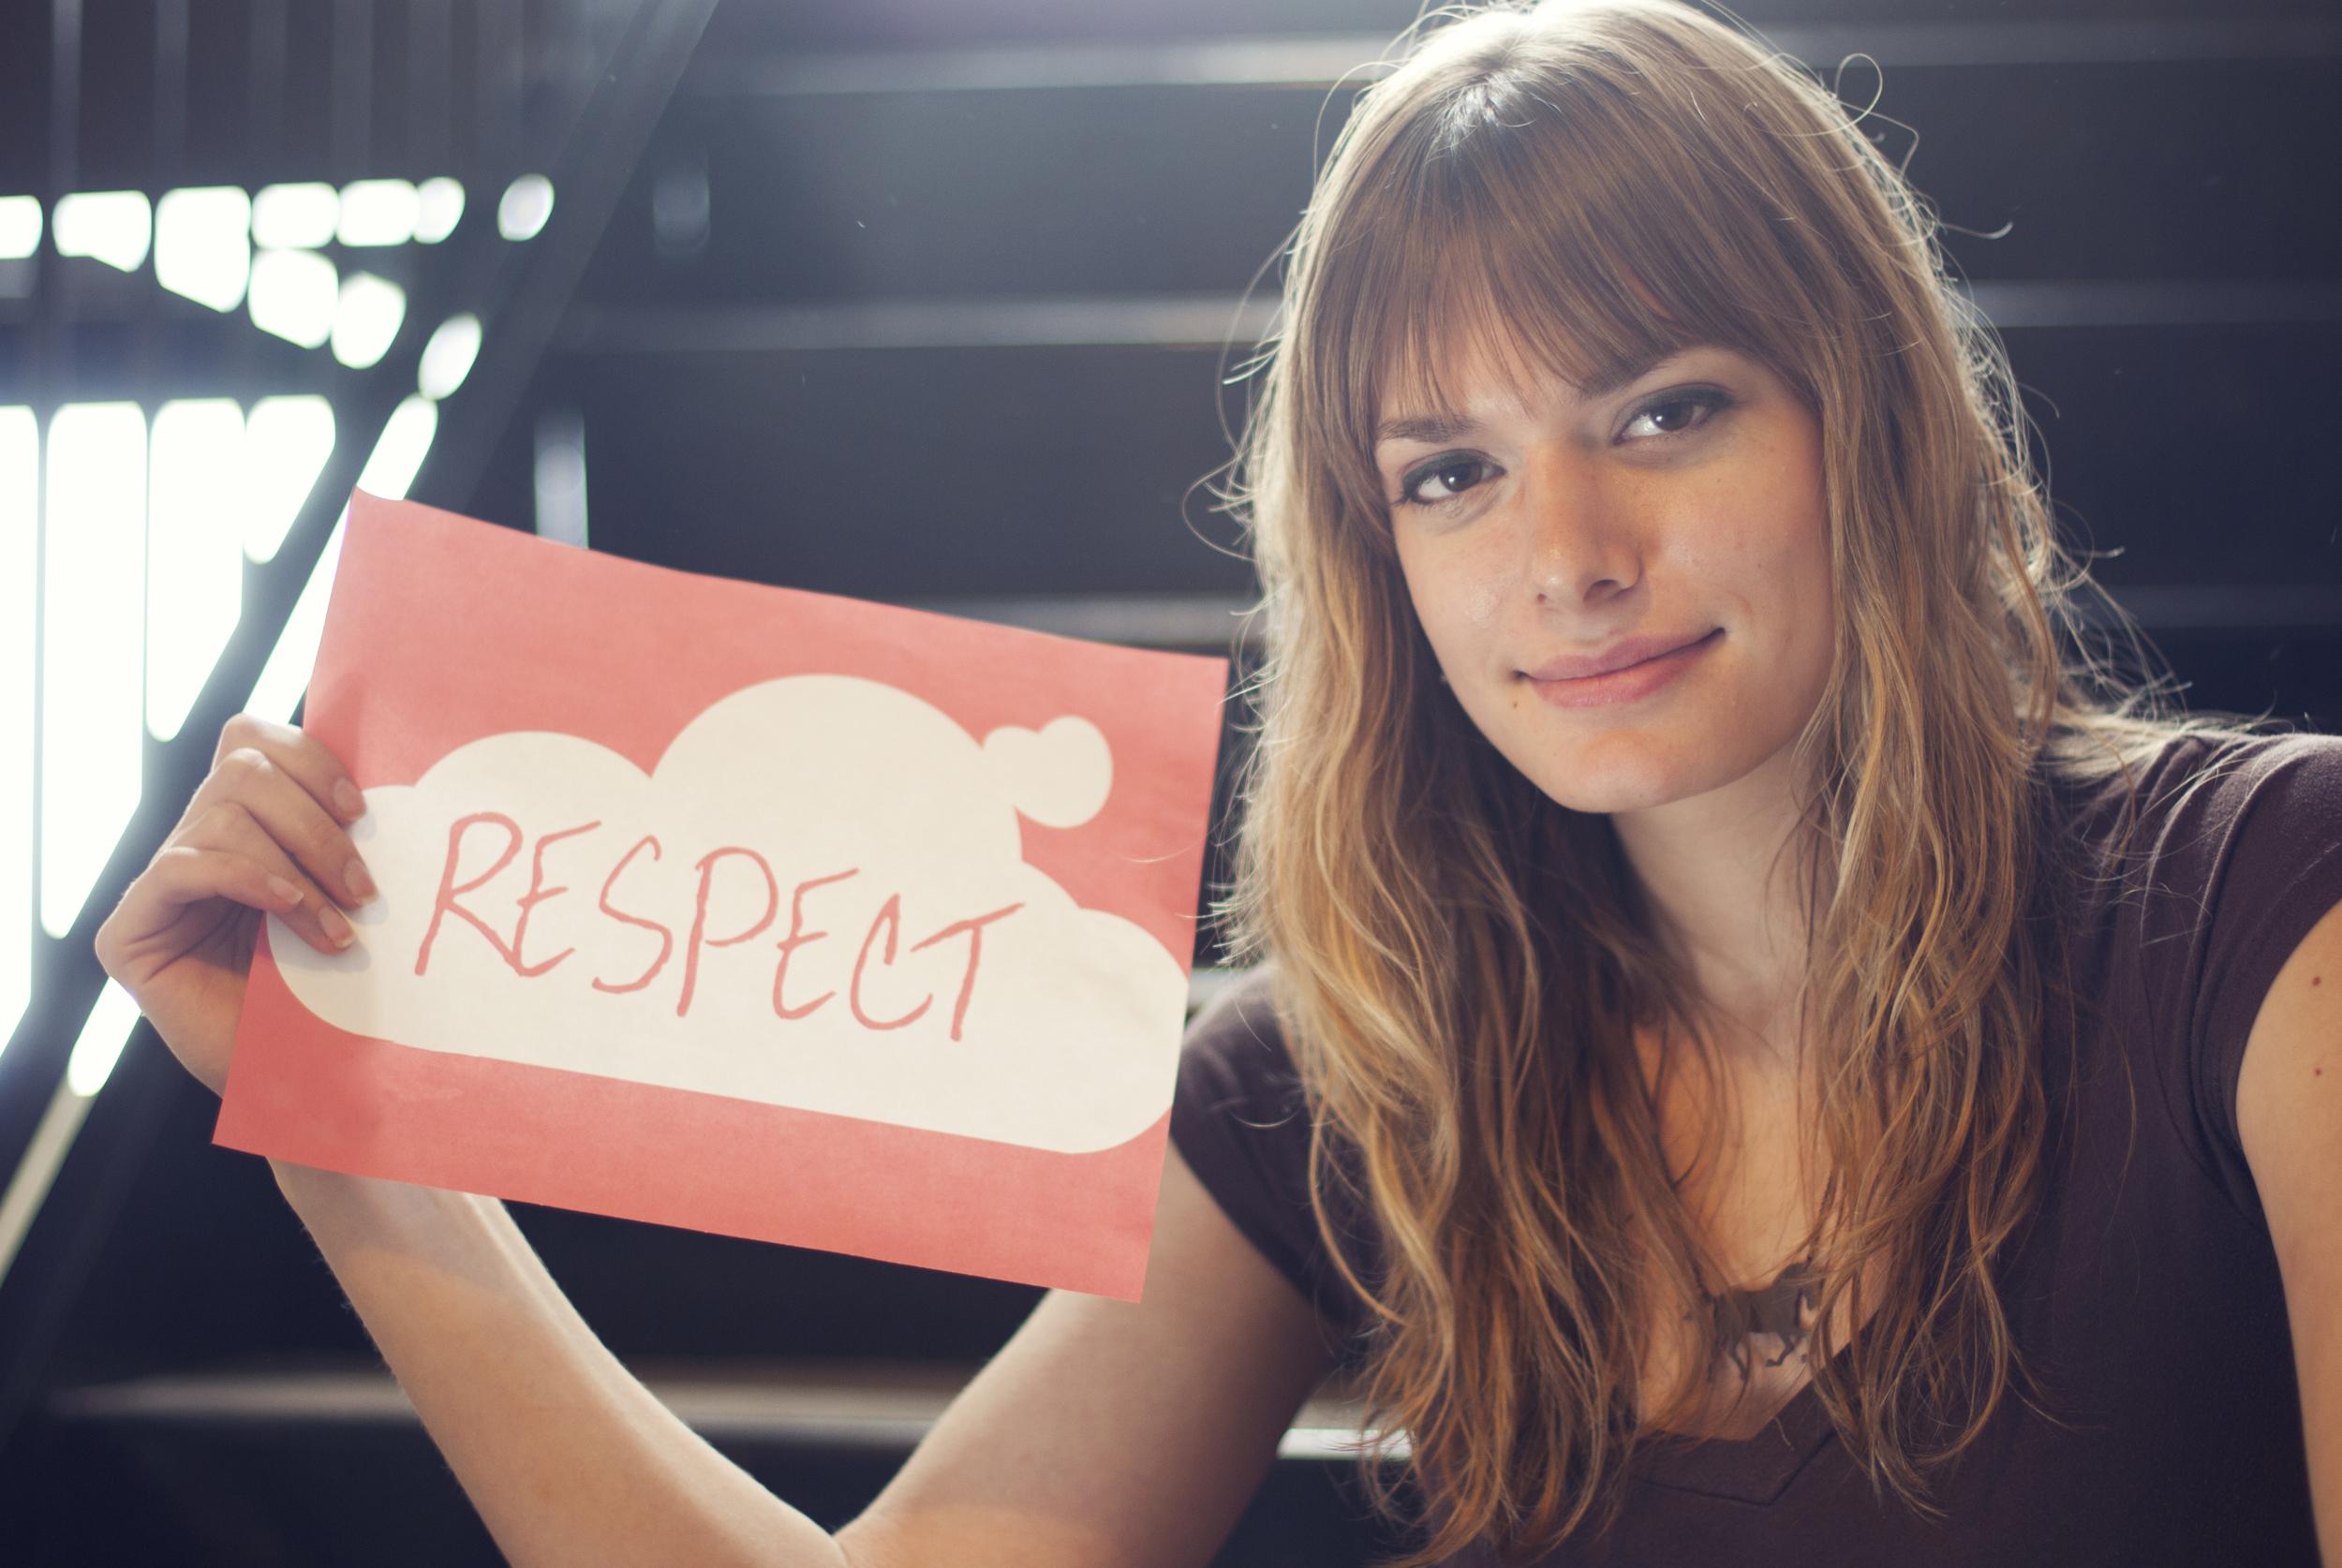 47_Respect Photoshoot 02.jpg